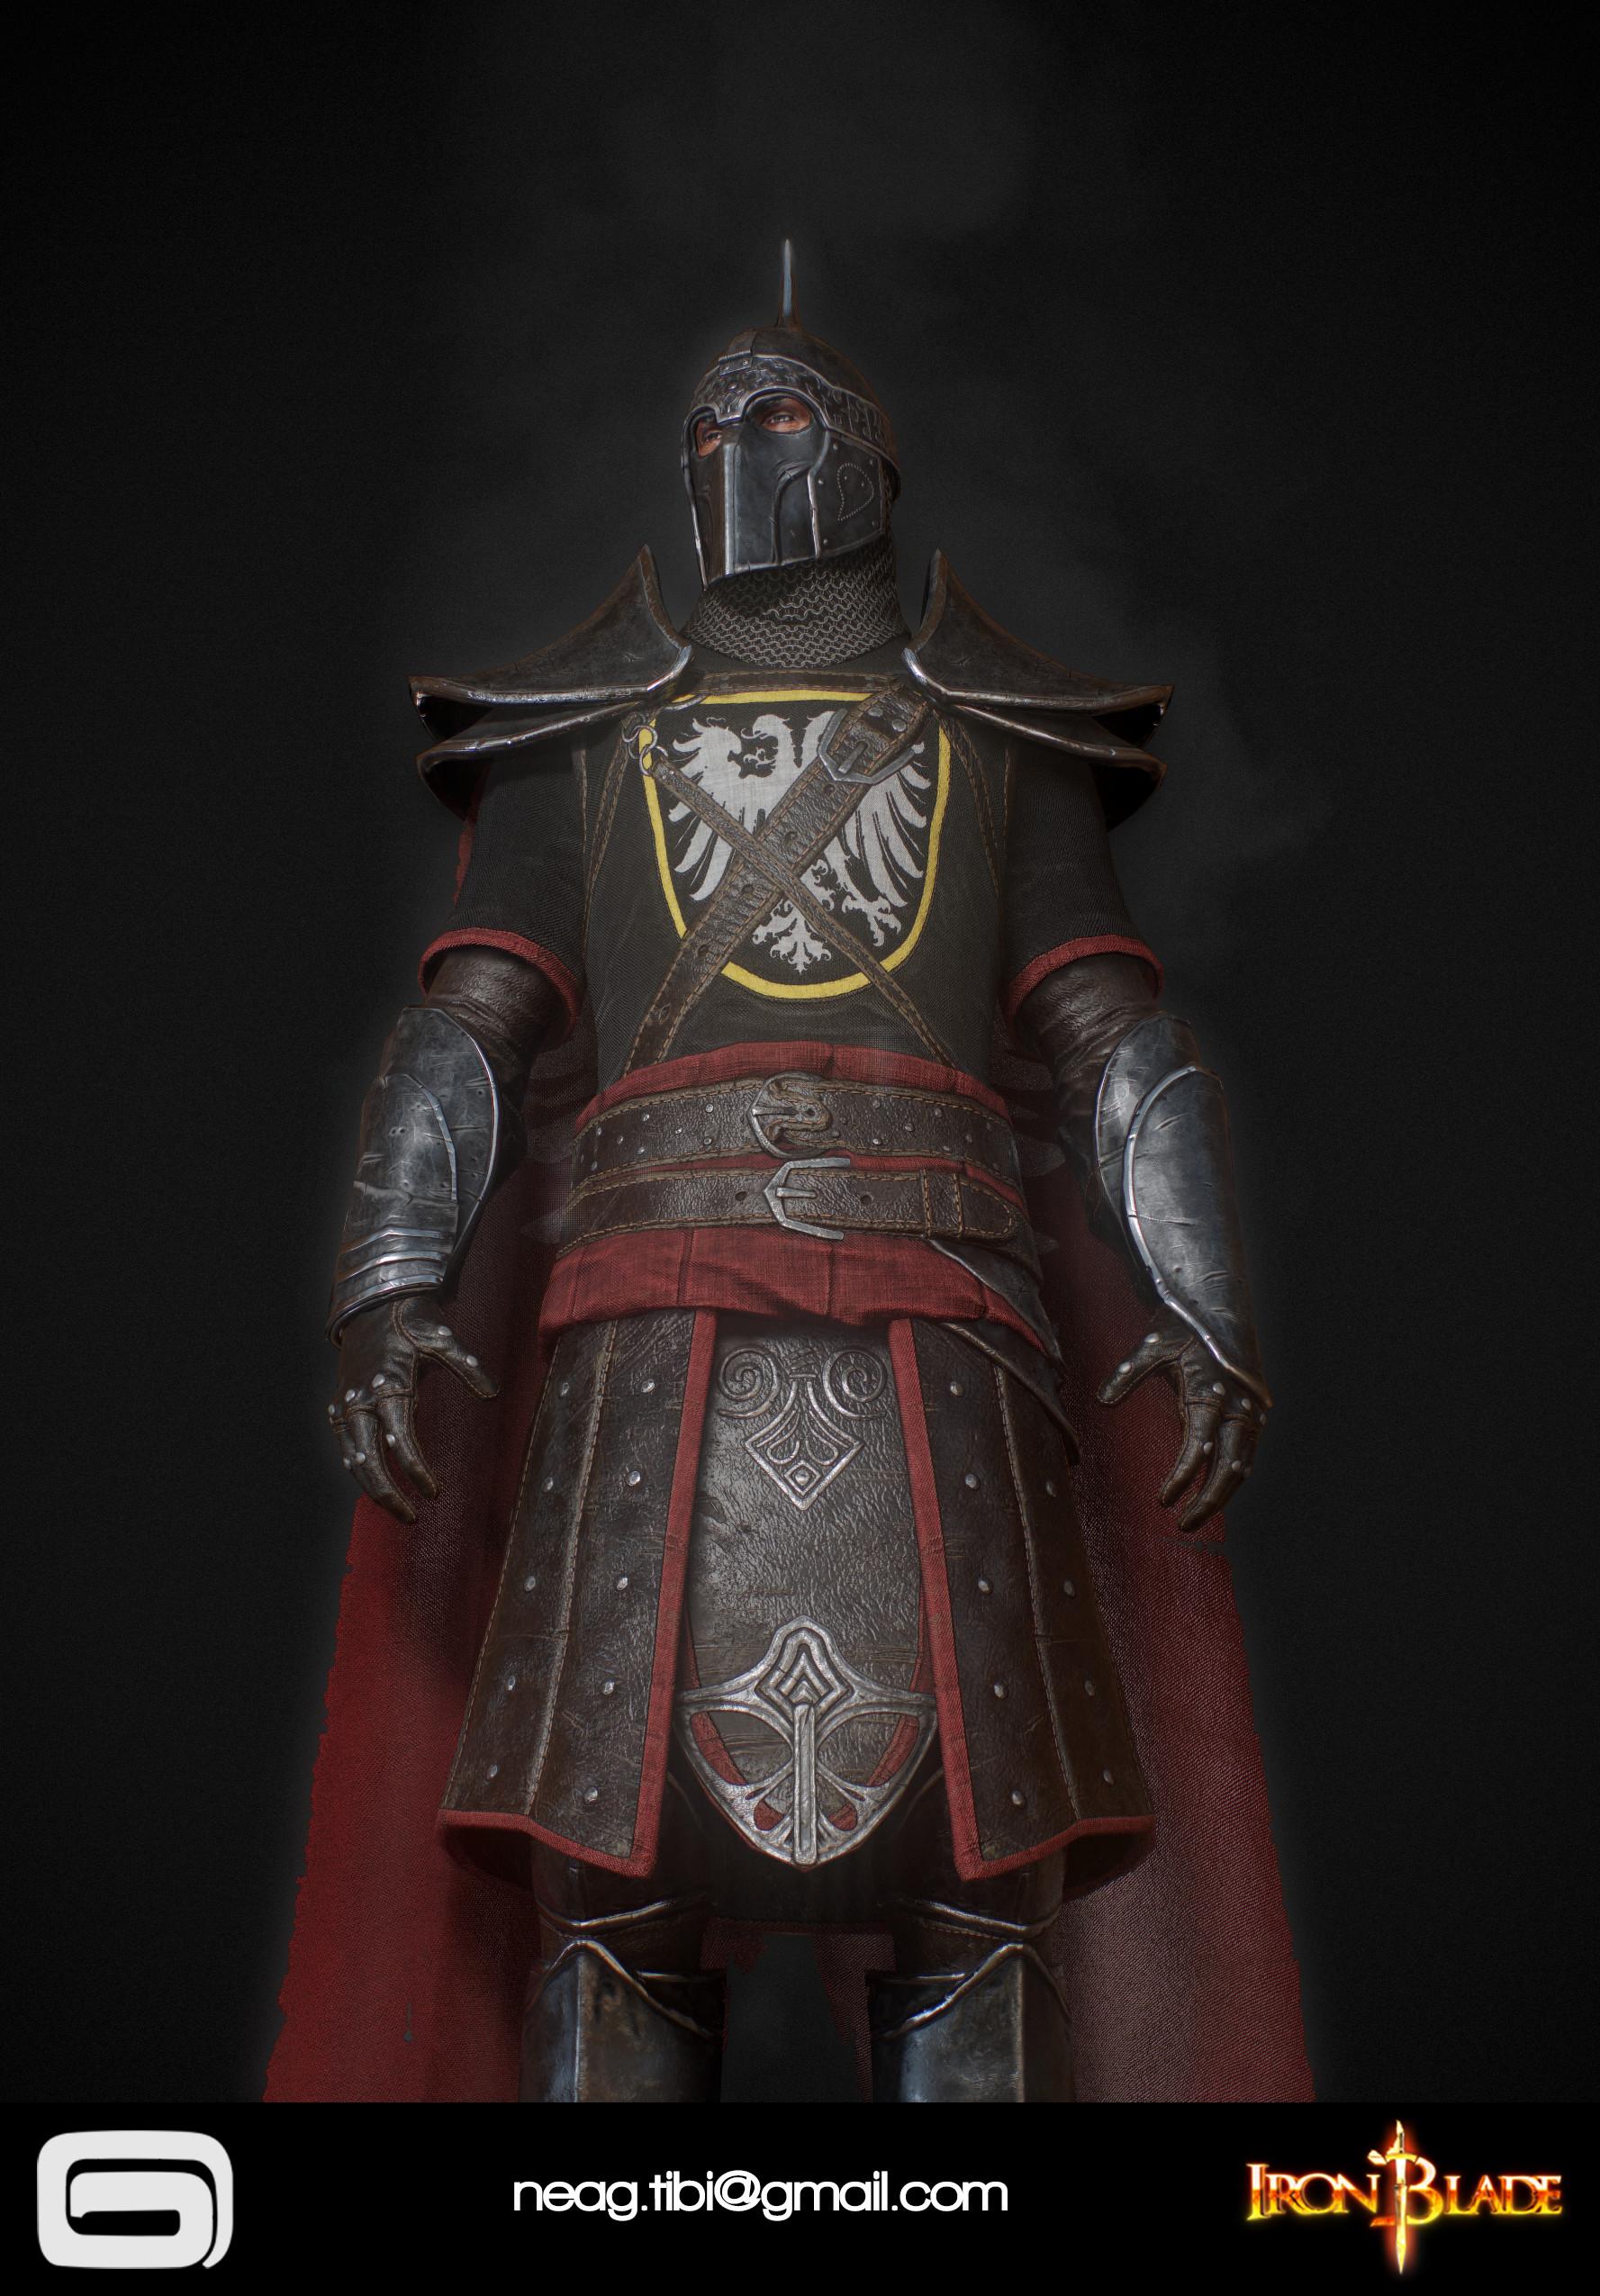 Tibi neag tibi neag iron blade mc armor 04b low poly 07